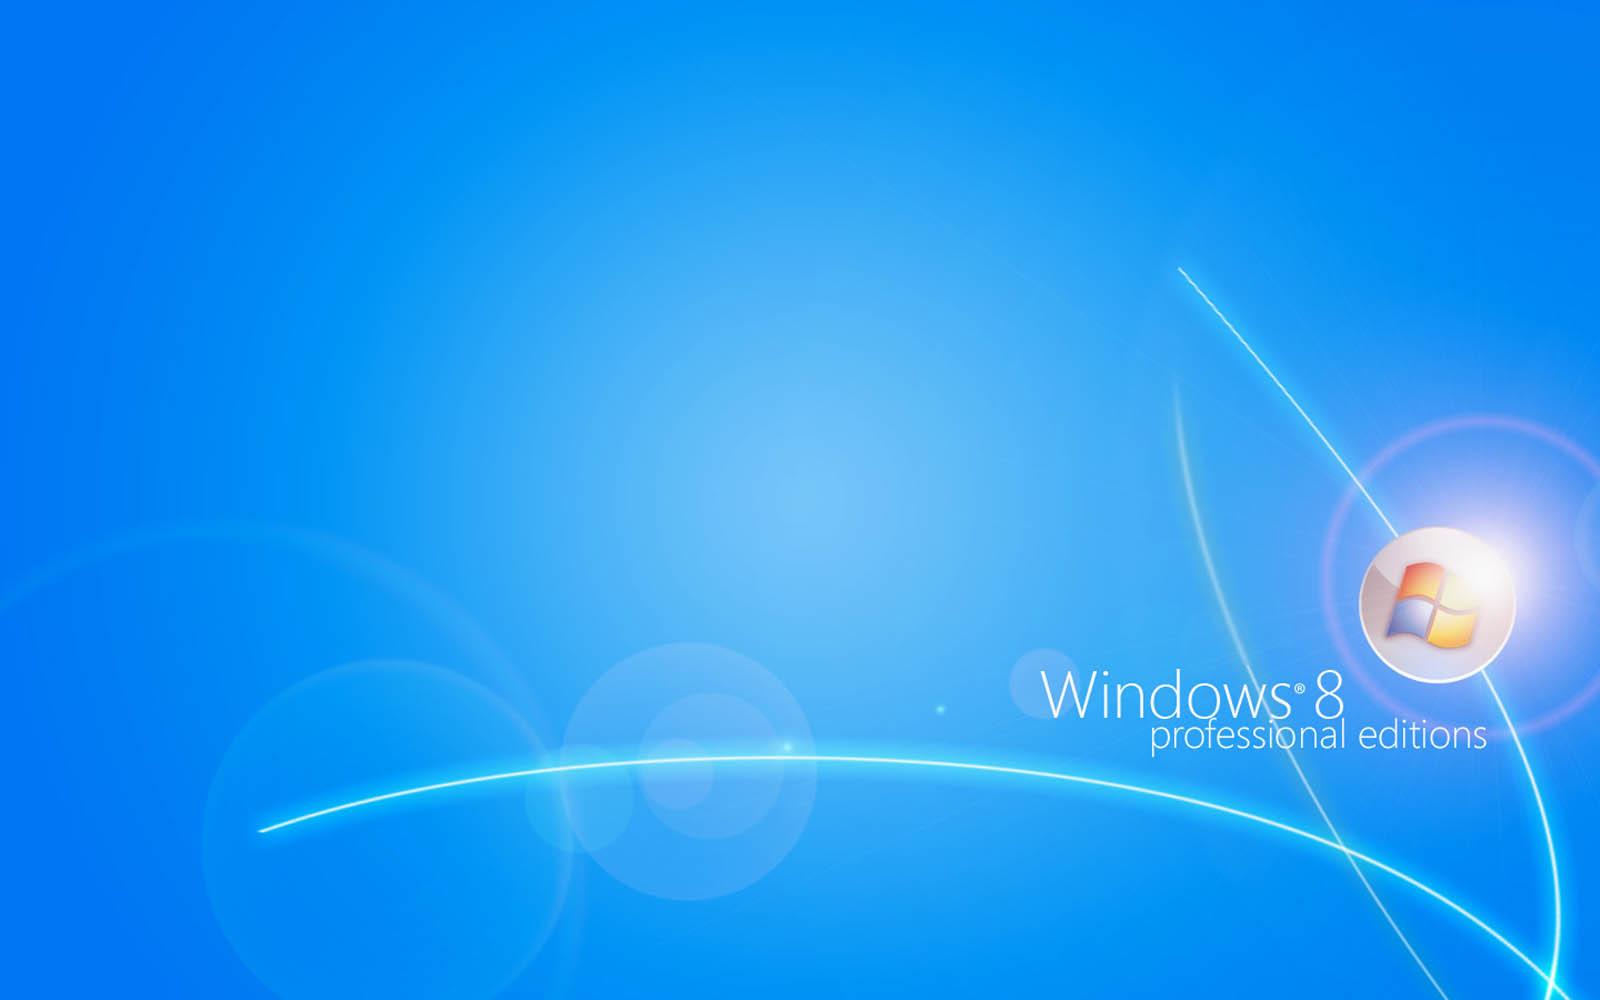 Live Wallpaper For Microsoft Surface Live Wallpaper - Windows 8 , HD Wallpaper & Backgrounds